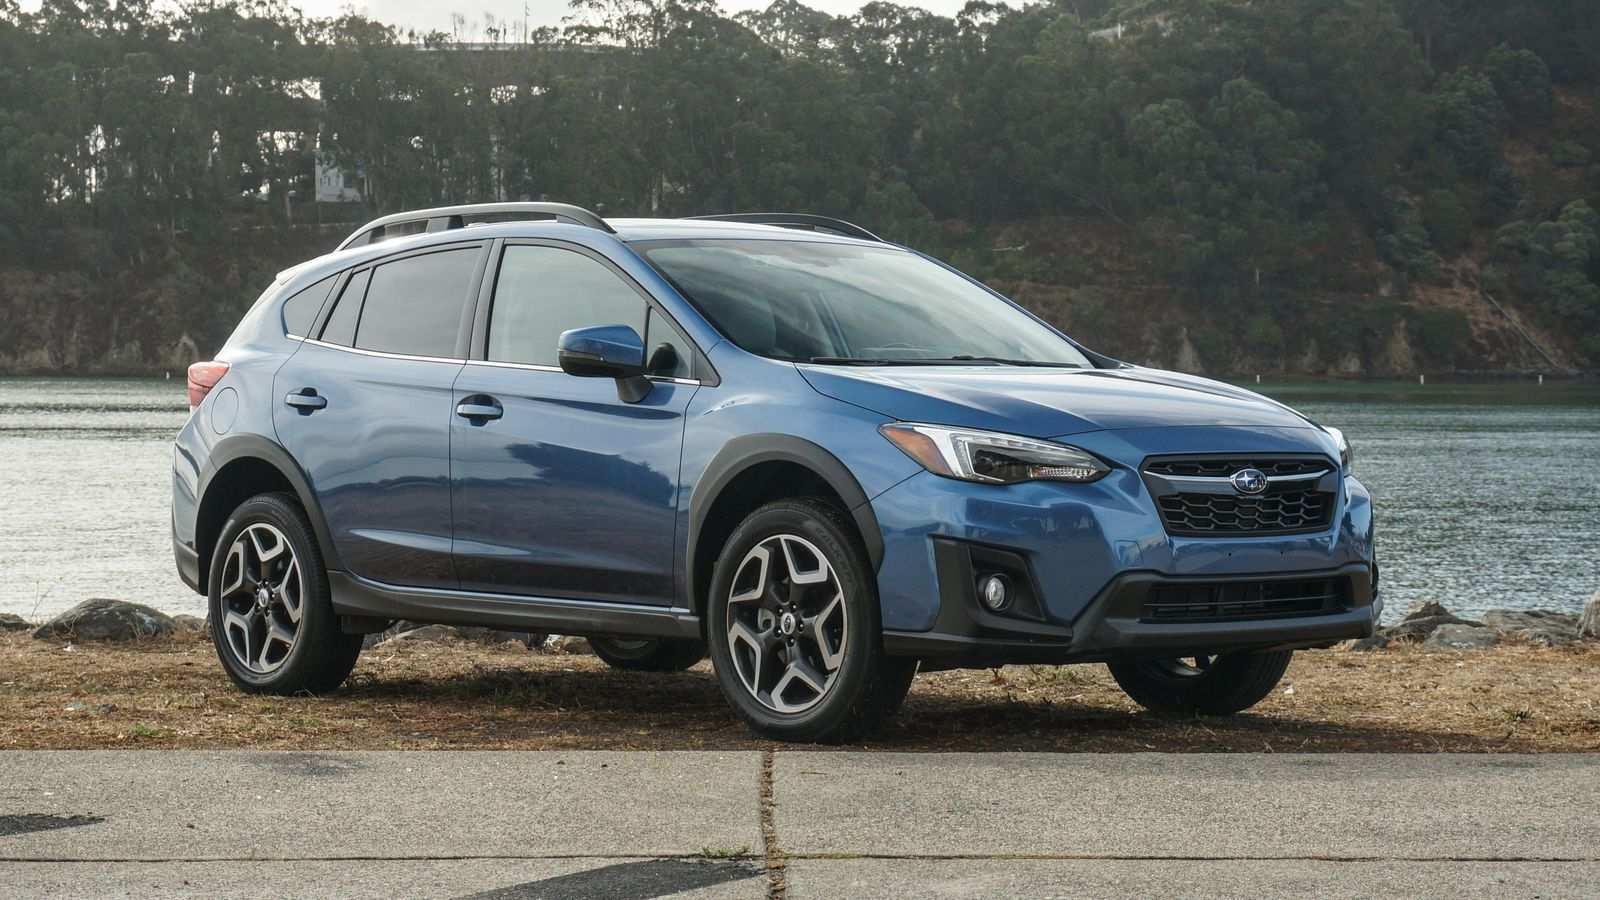 62 Great Subaru 2019 Crosstrek Hybrid Price And Release Date Images for Subaru 2019 Crosstrek Hybrid Price And Release Date